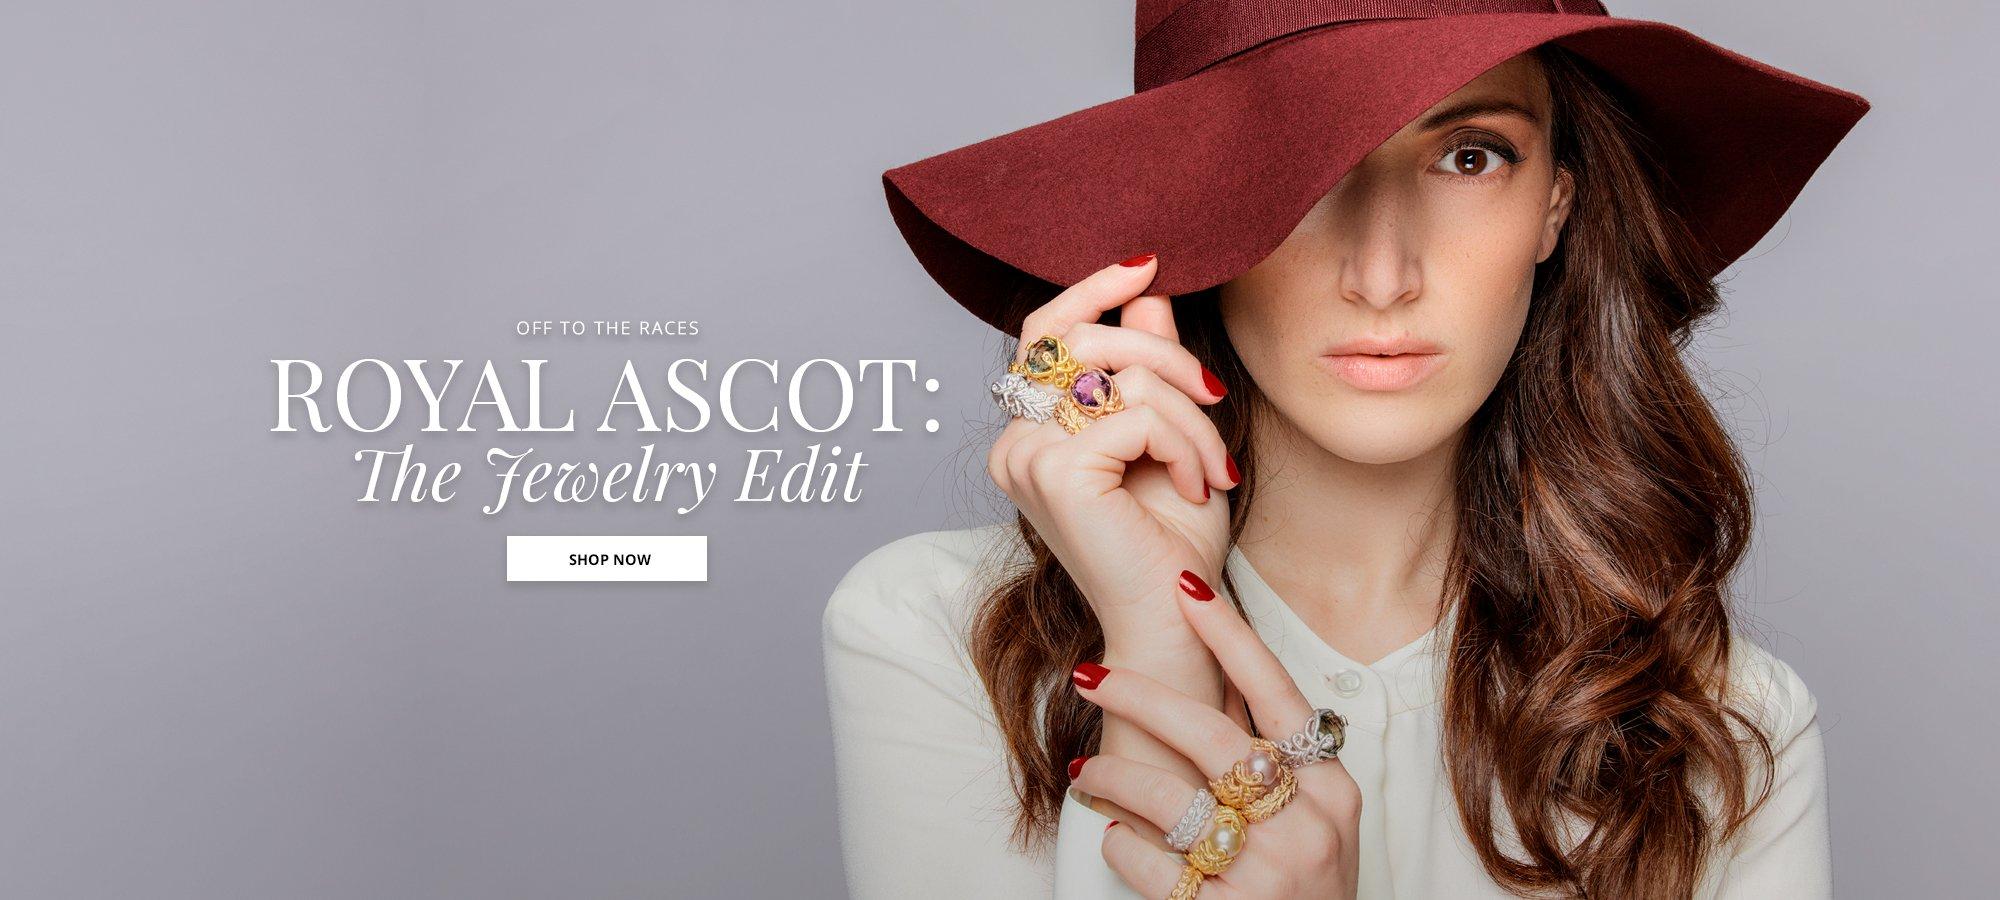 Ascot Jewelry